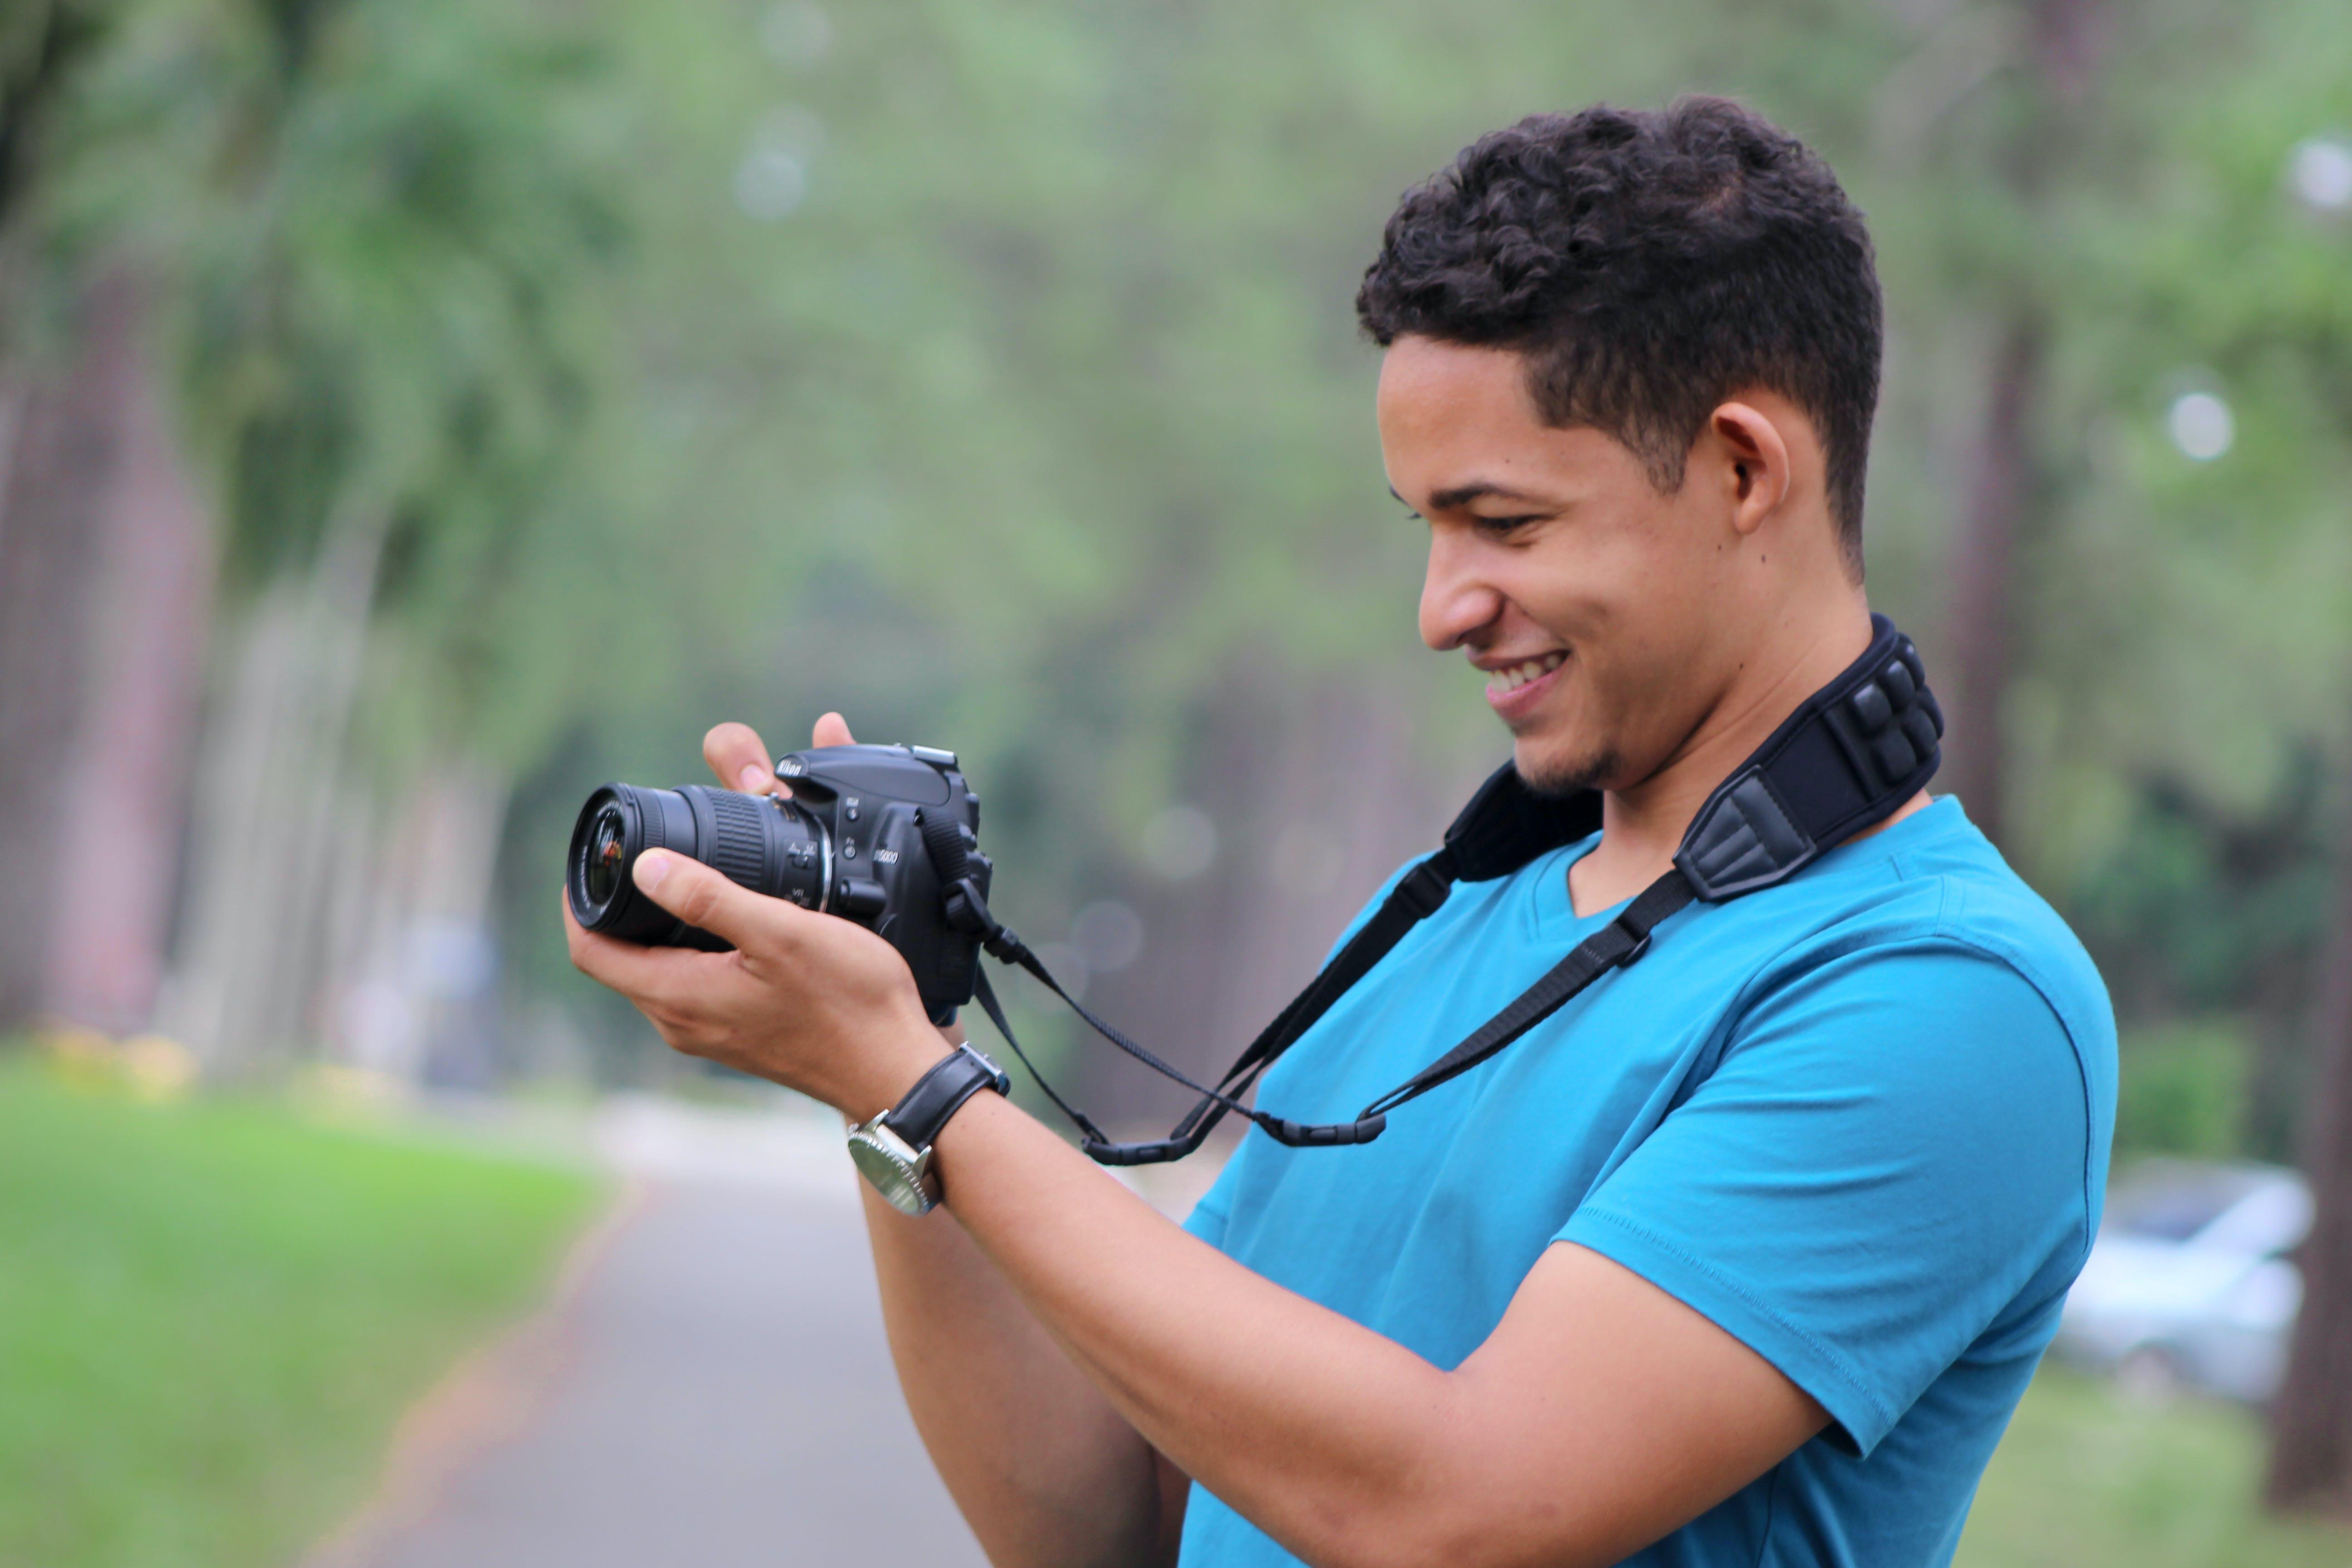 Men's Black Dslr Camera